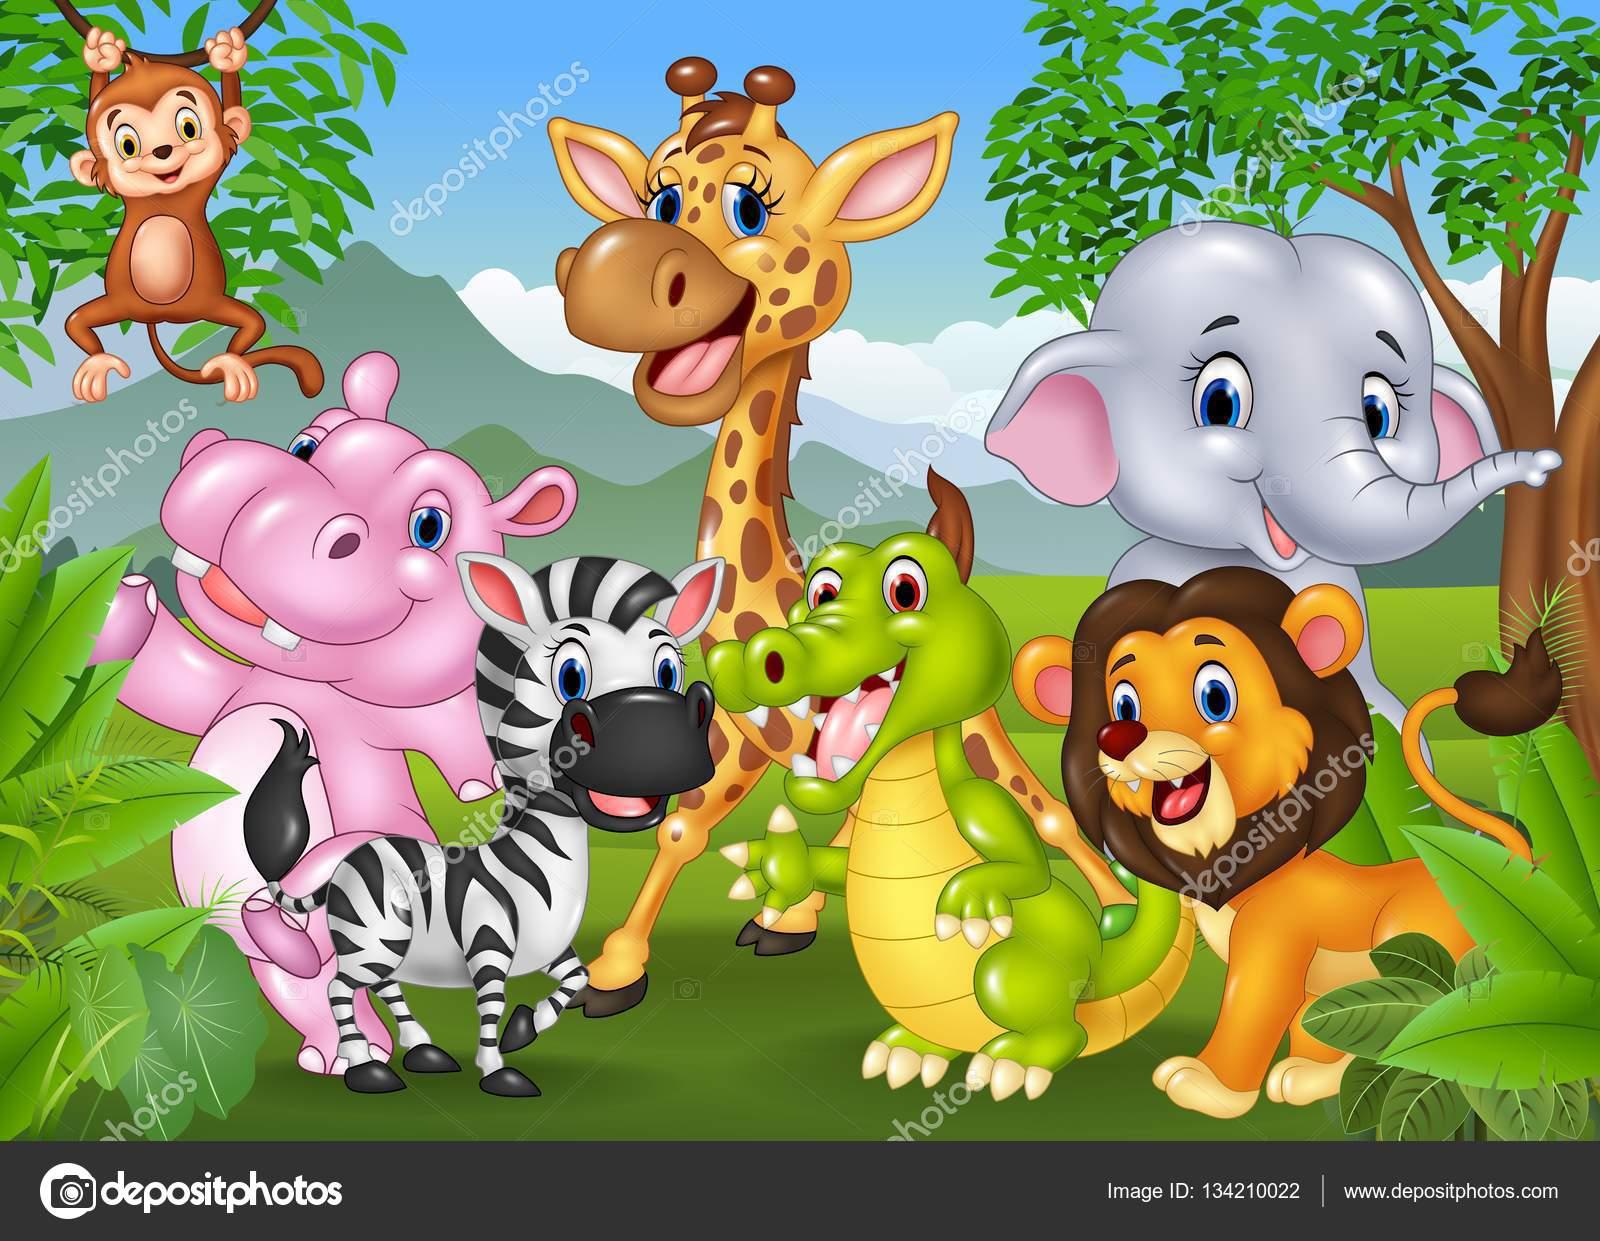 Fondos De Animales Animados: Dibujos: Animados De Animales